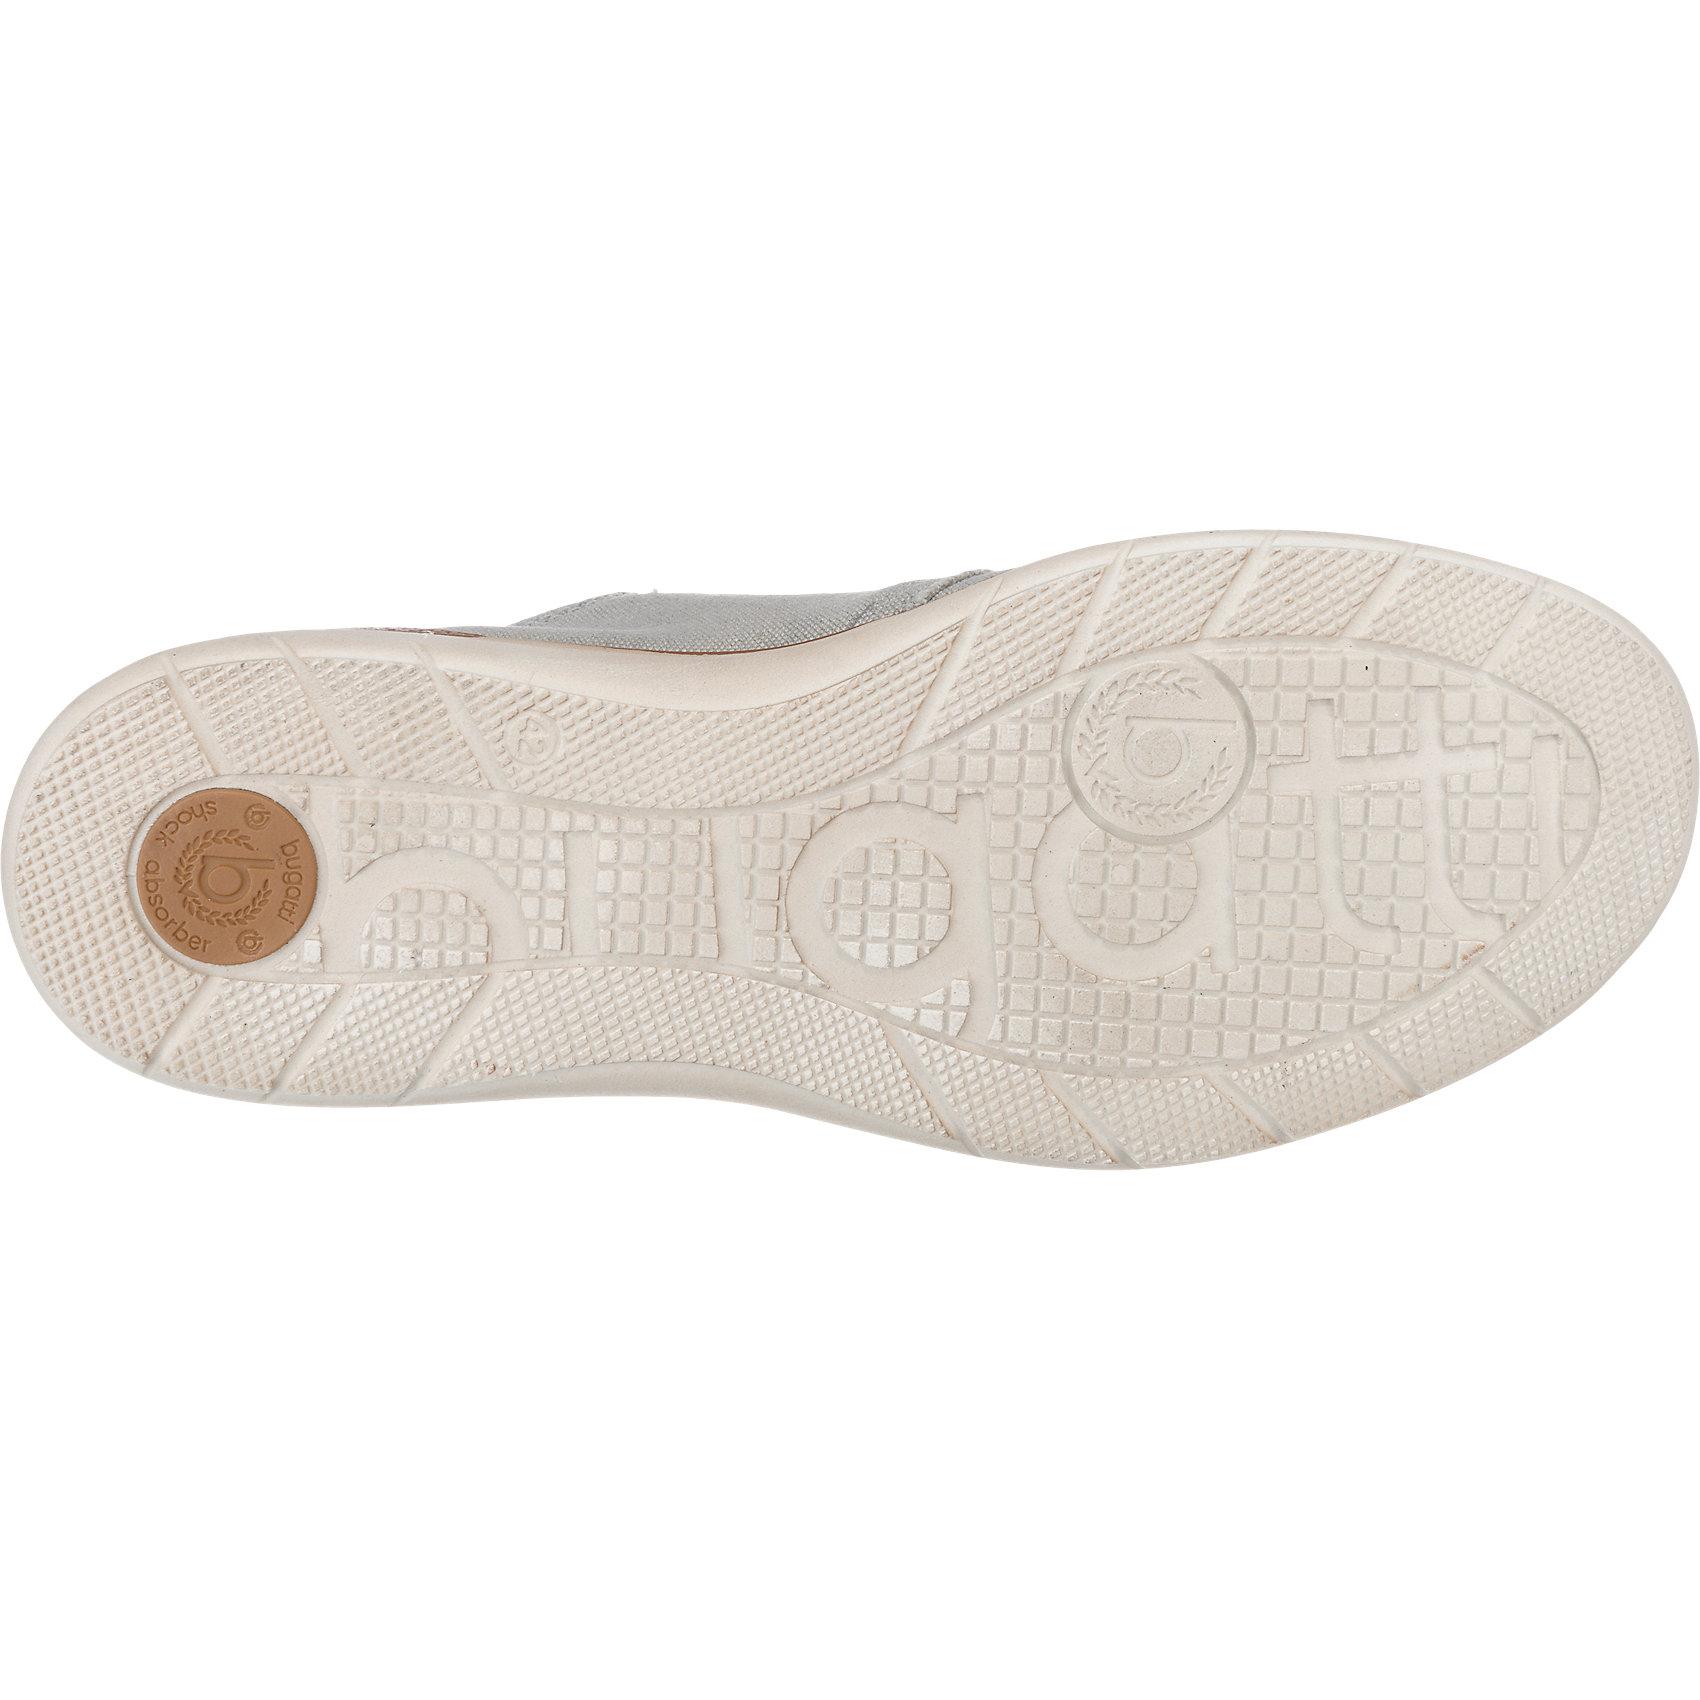 Neu bugatti Freizeit Schuhe Schuhe Schuhe grau kombi blau